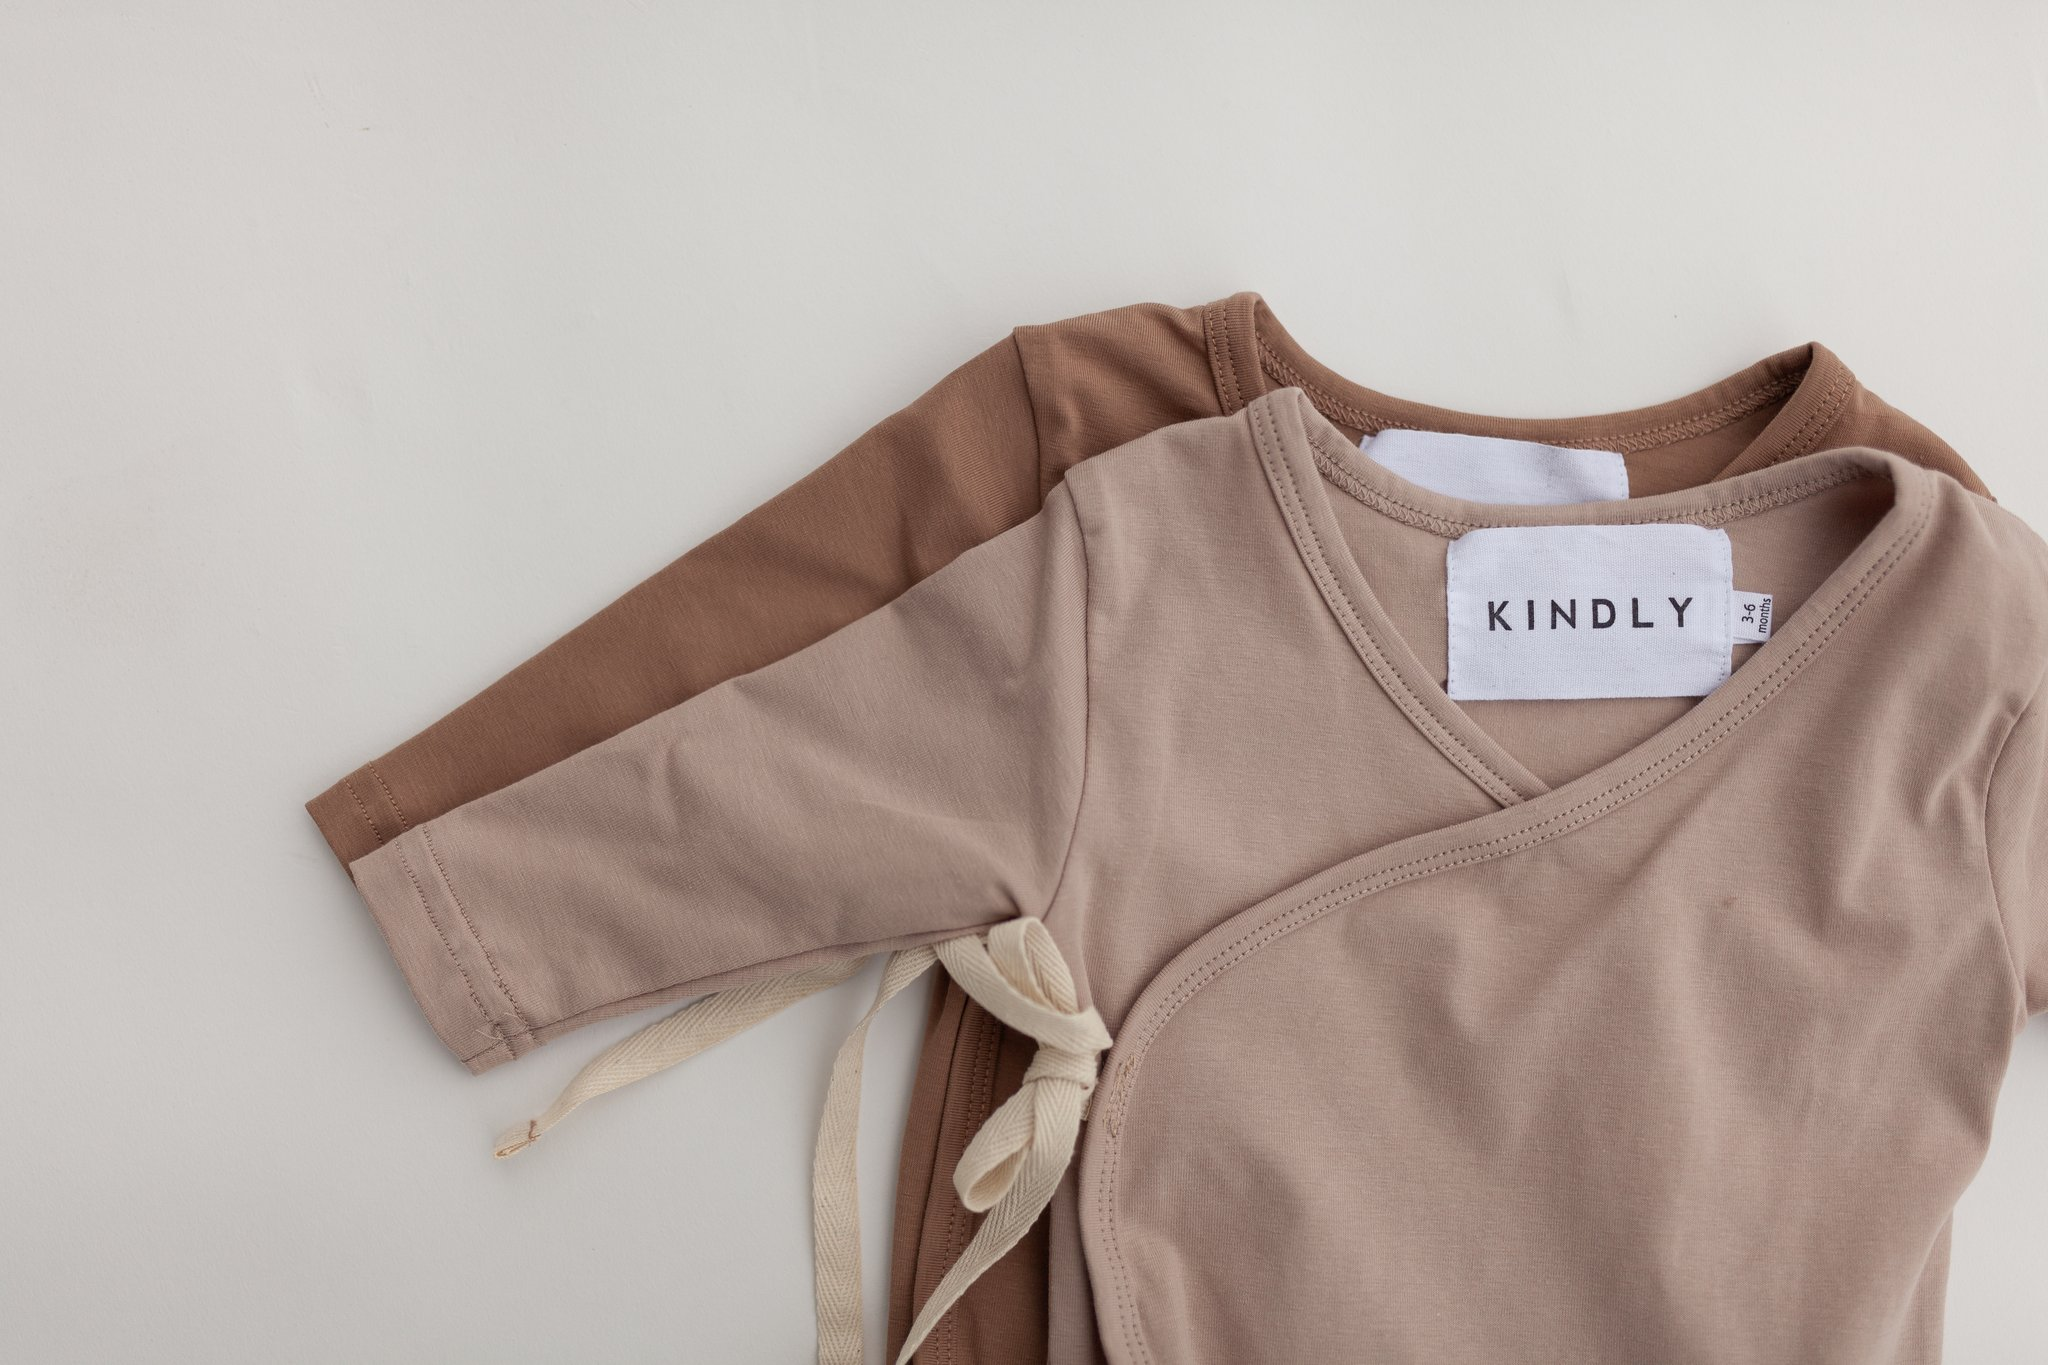 KINDLY (tidligere Fieldday) Kimono onesie - Cappuccino & Light Mocca -